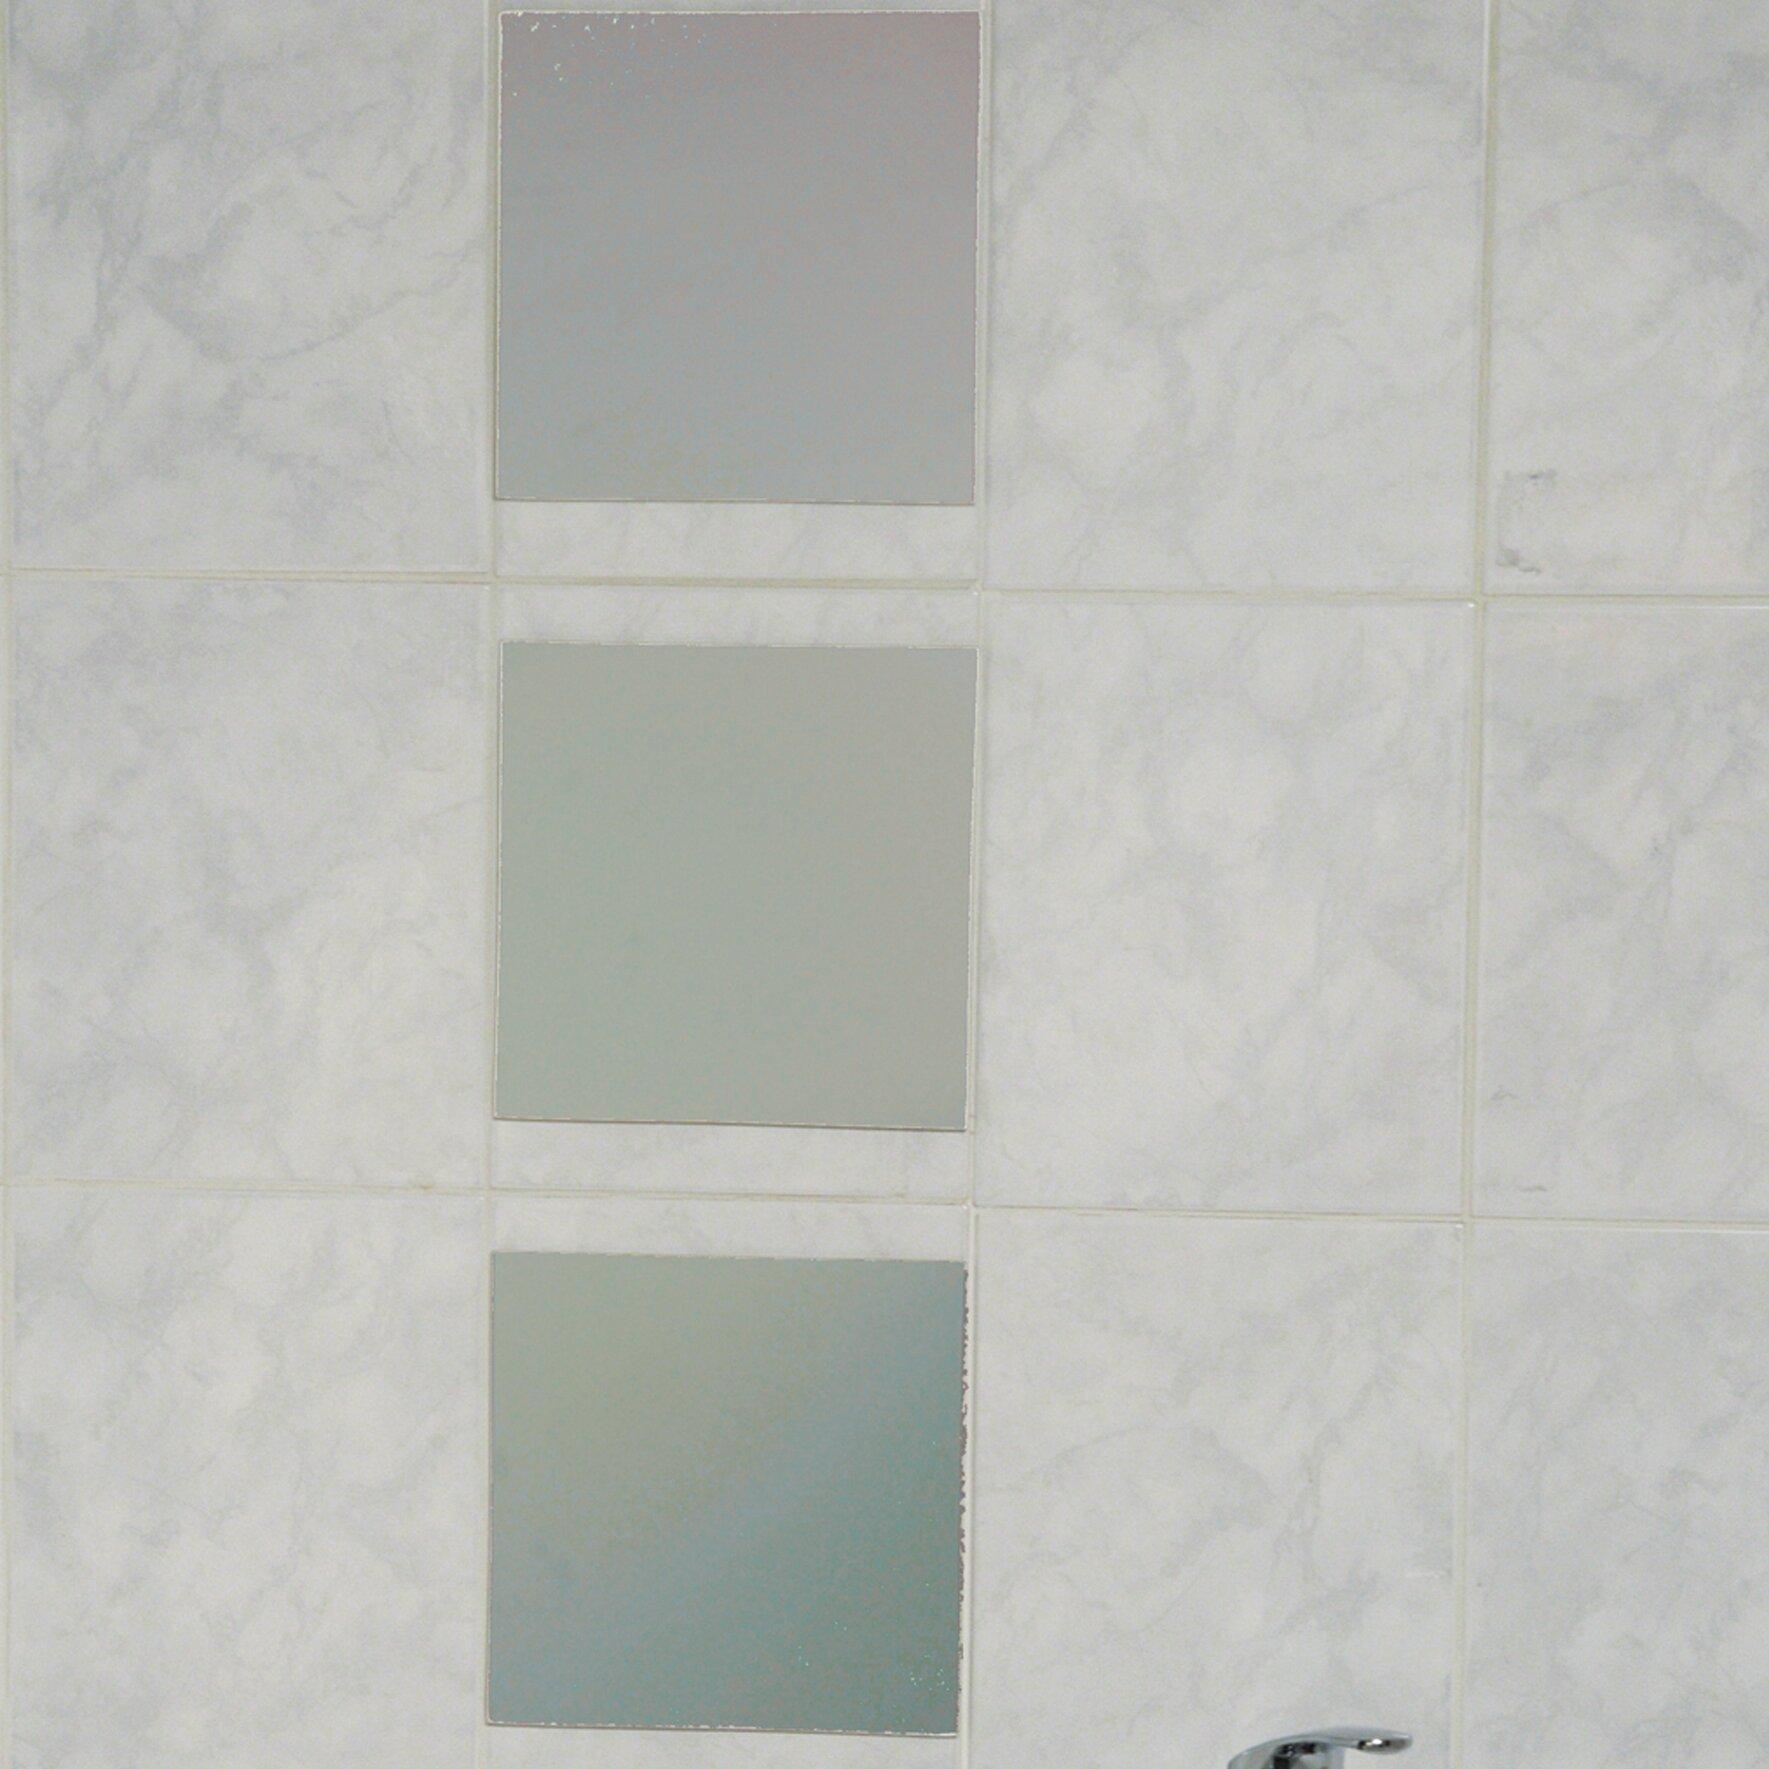 evideco mirrorfina adhesive square decorative bath wall mirror reviews wayfair. Black Bedroom Furniture Sets. Home Design Ideas